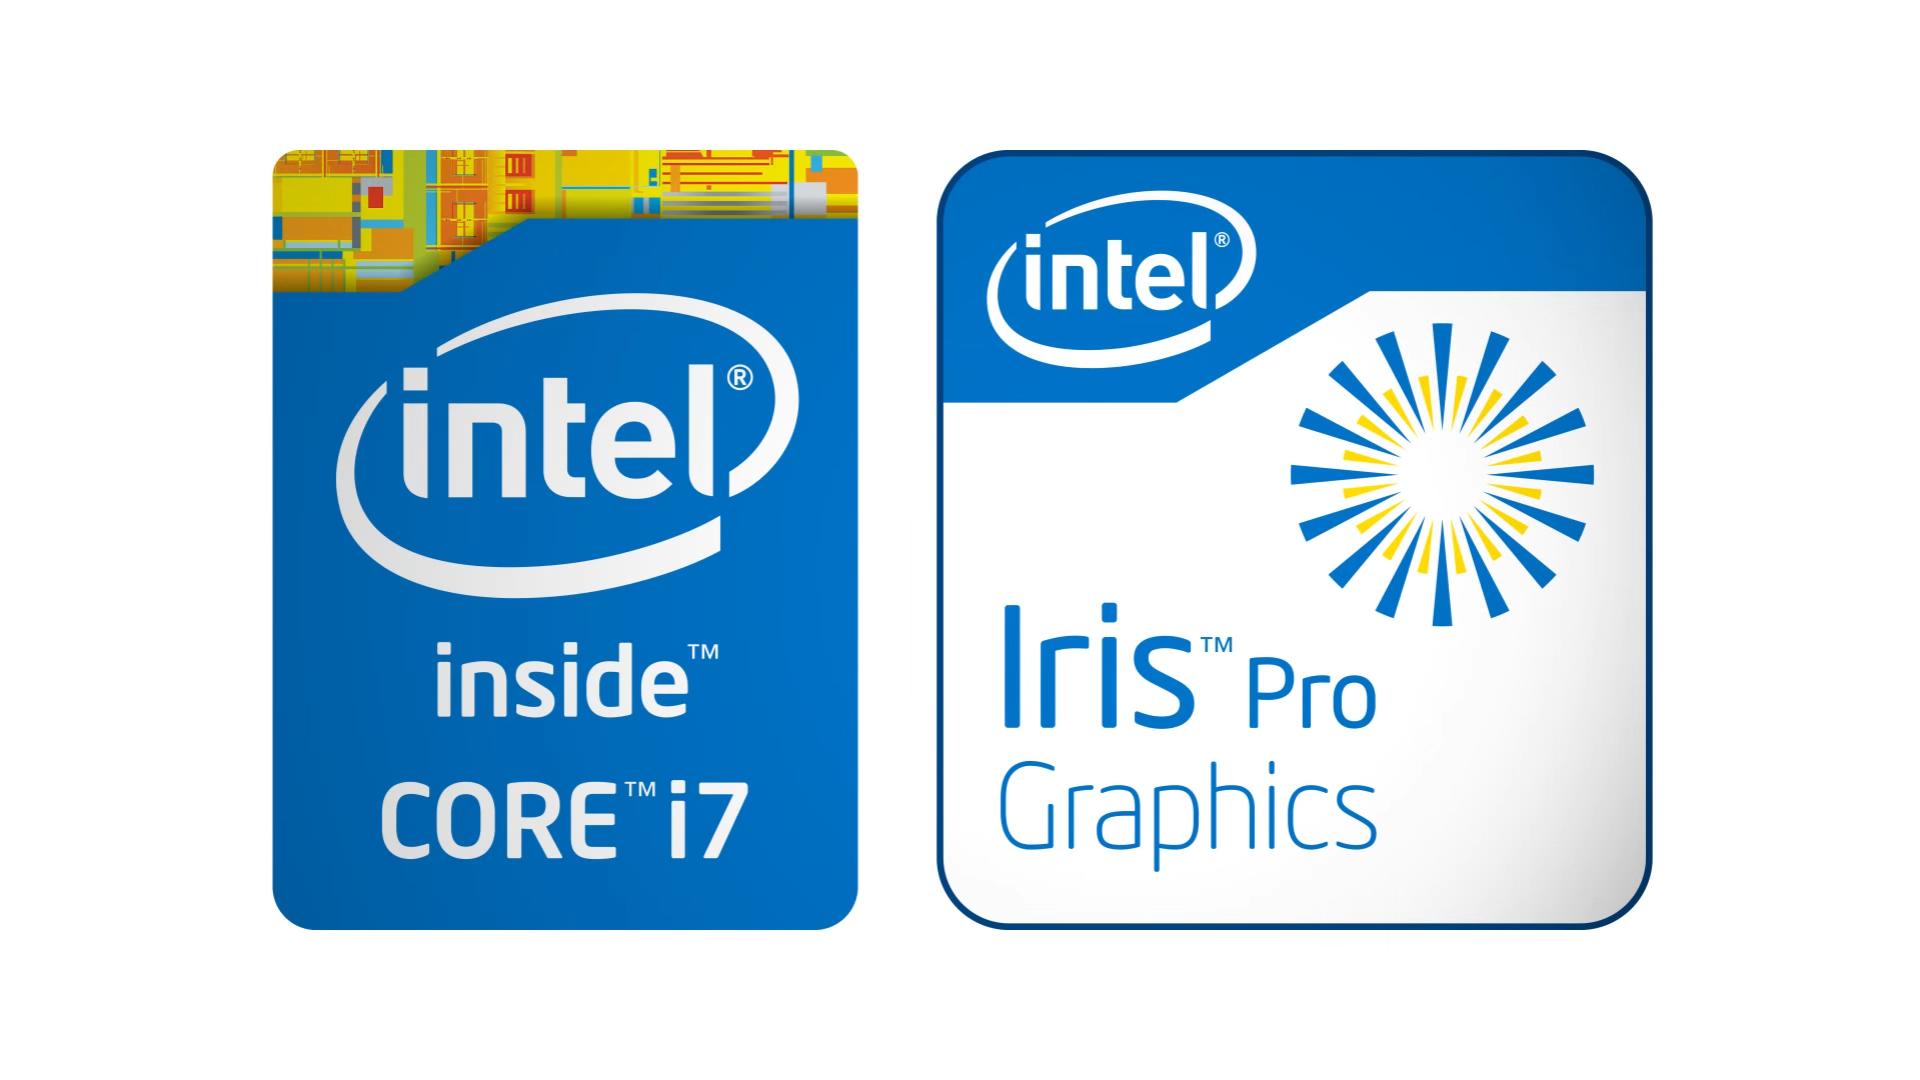 Графика: HD, Iris, Iris Pro